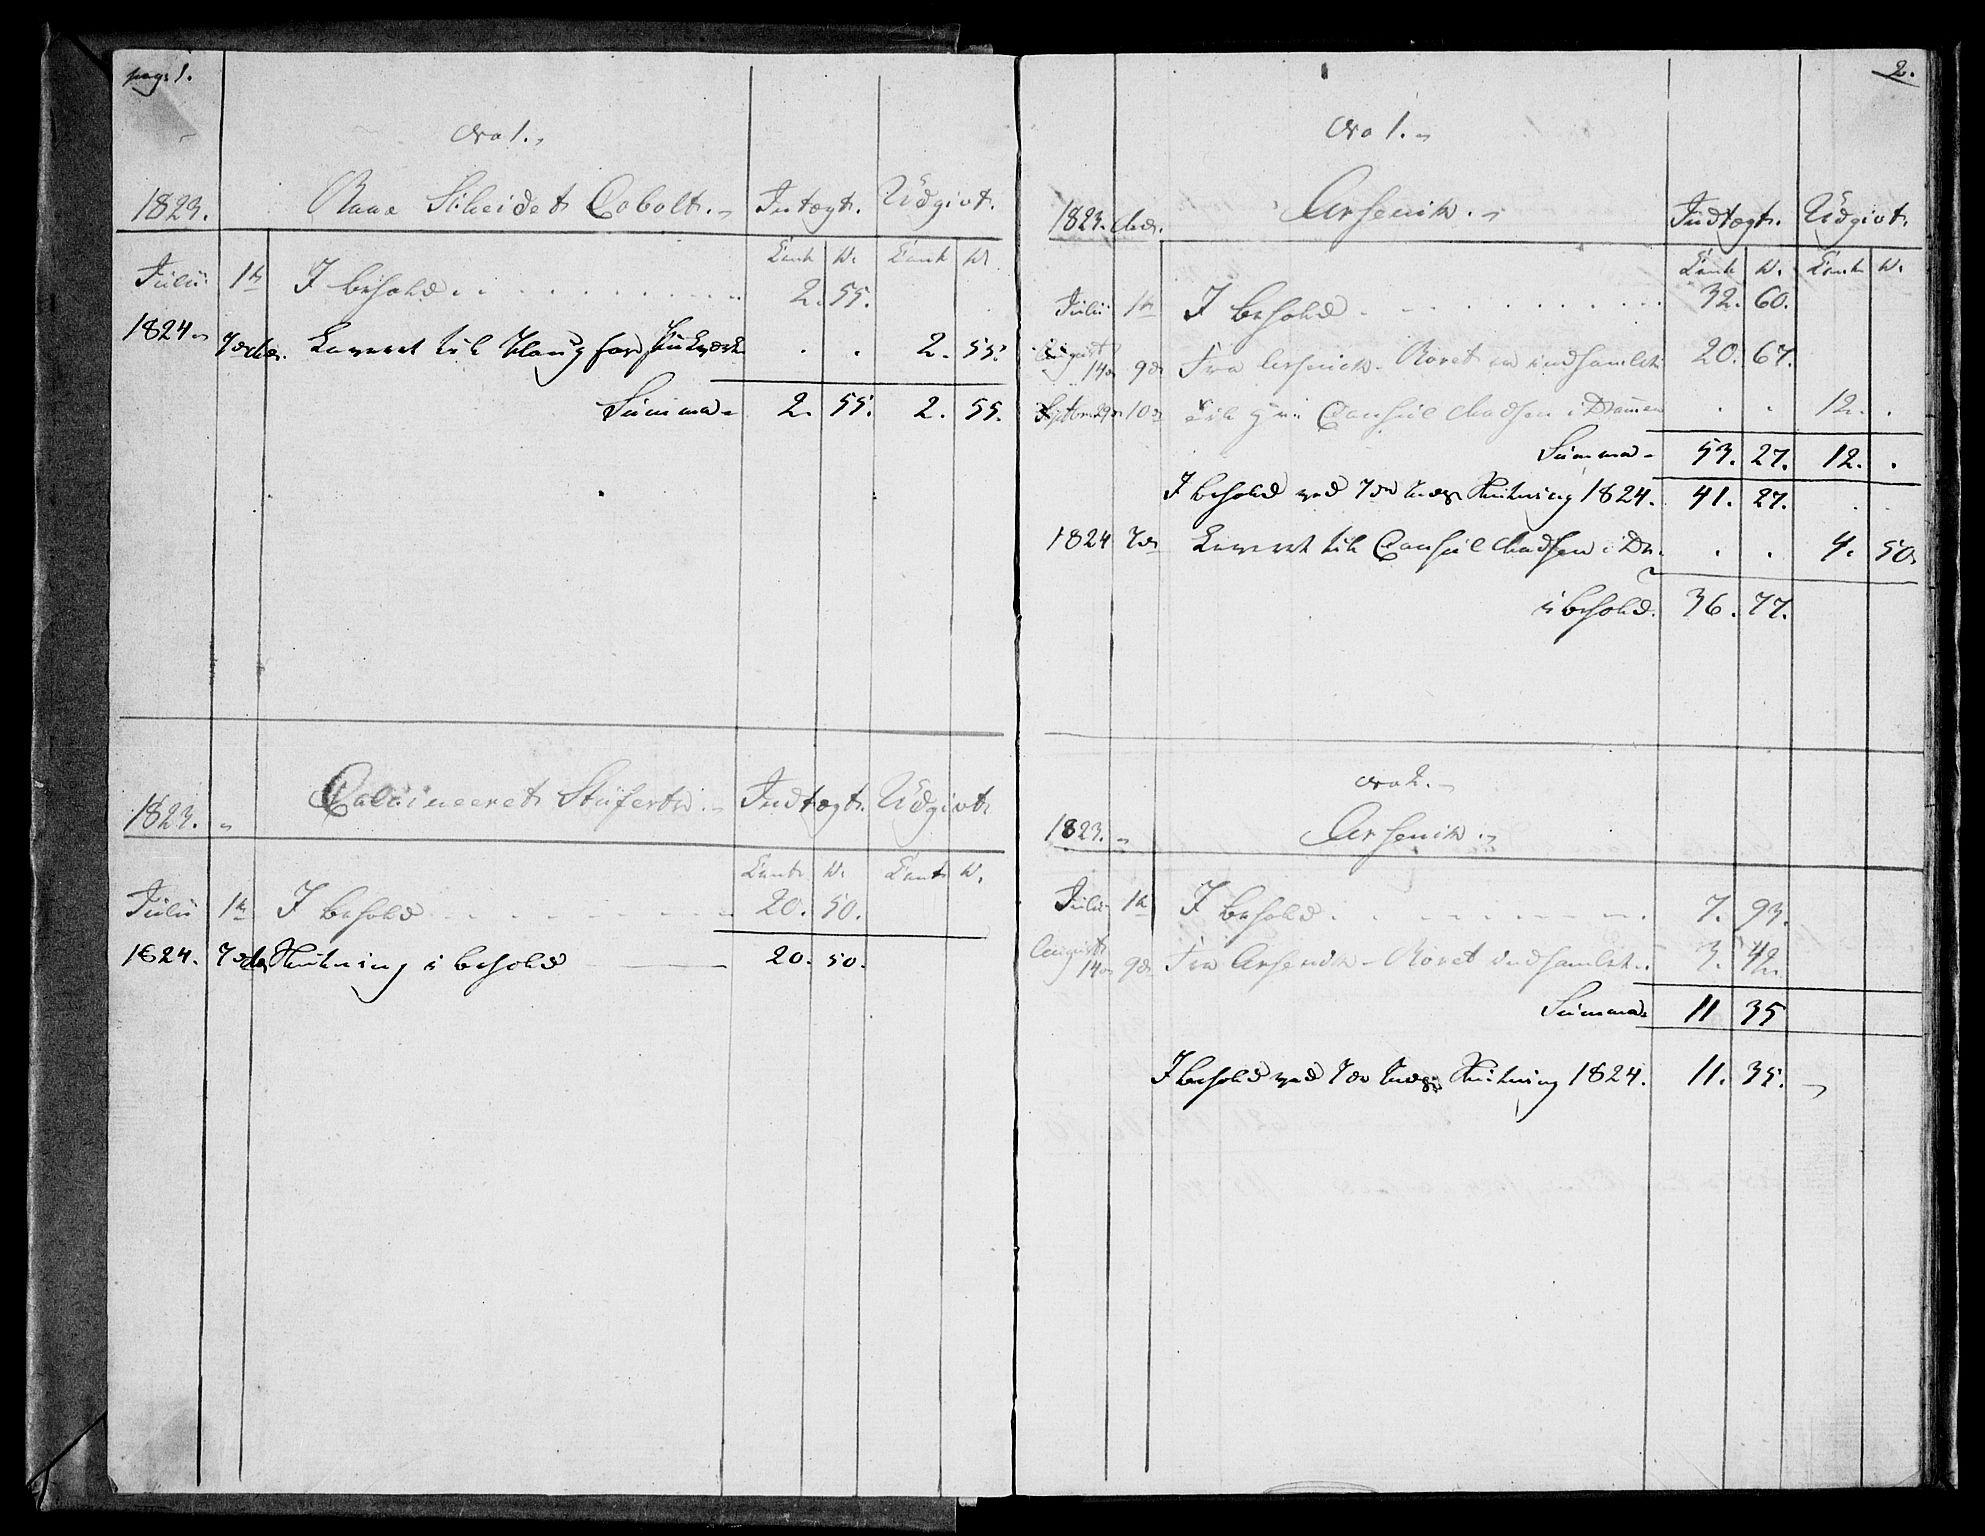 RA, Modums Blaafarveværk, G/Gd/Gdb/L0189: Materialhovedbok, 1823-1824, s. 2